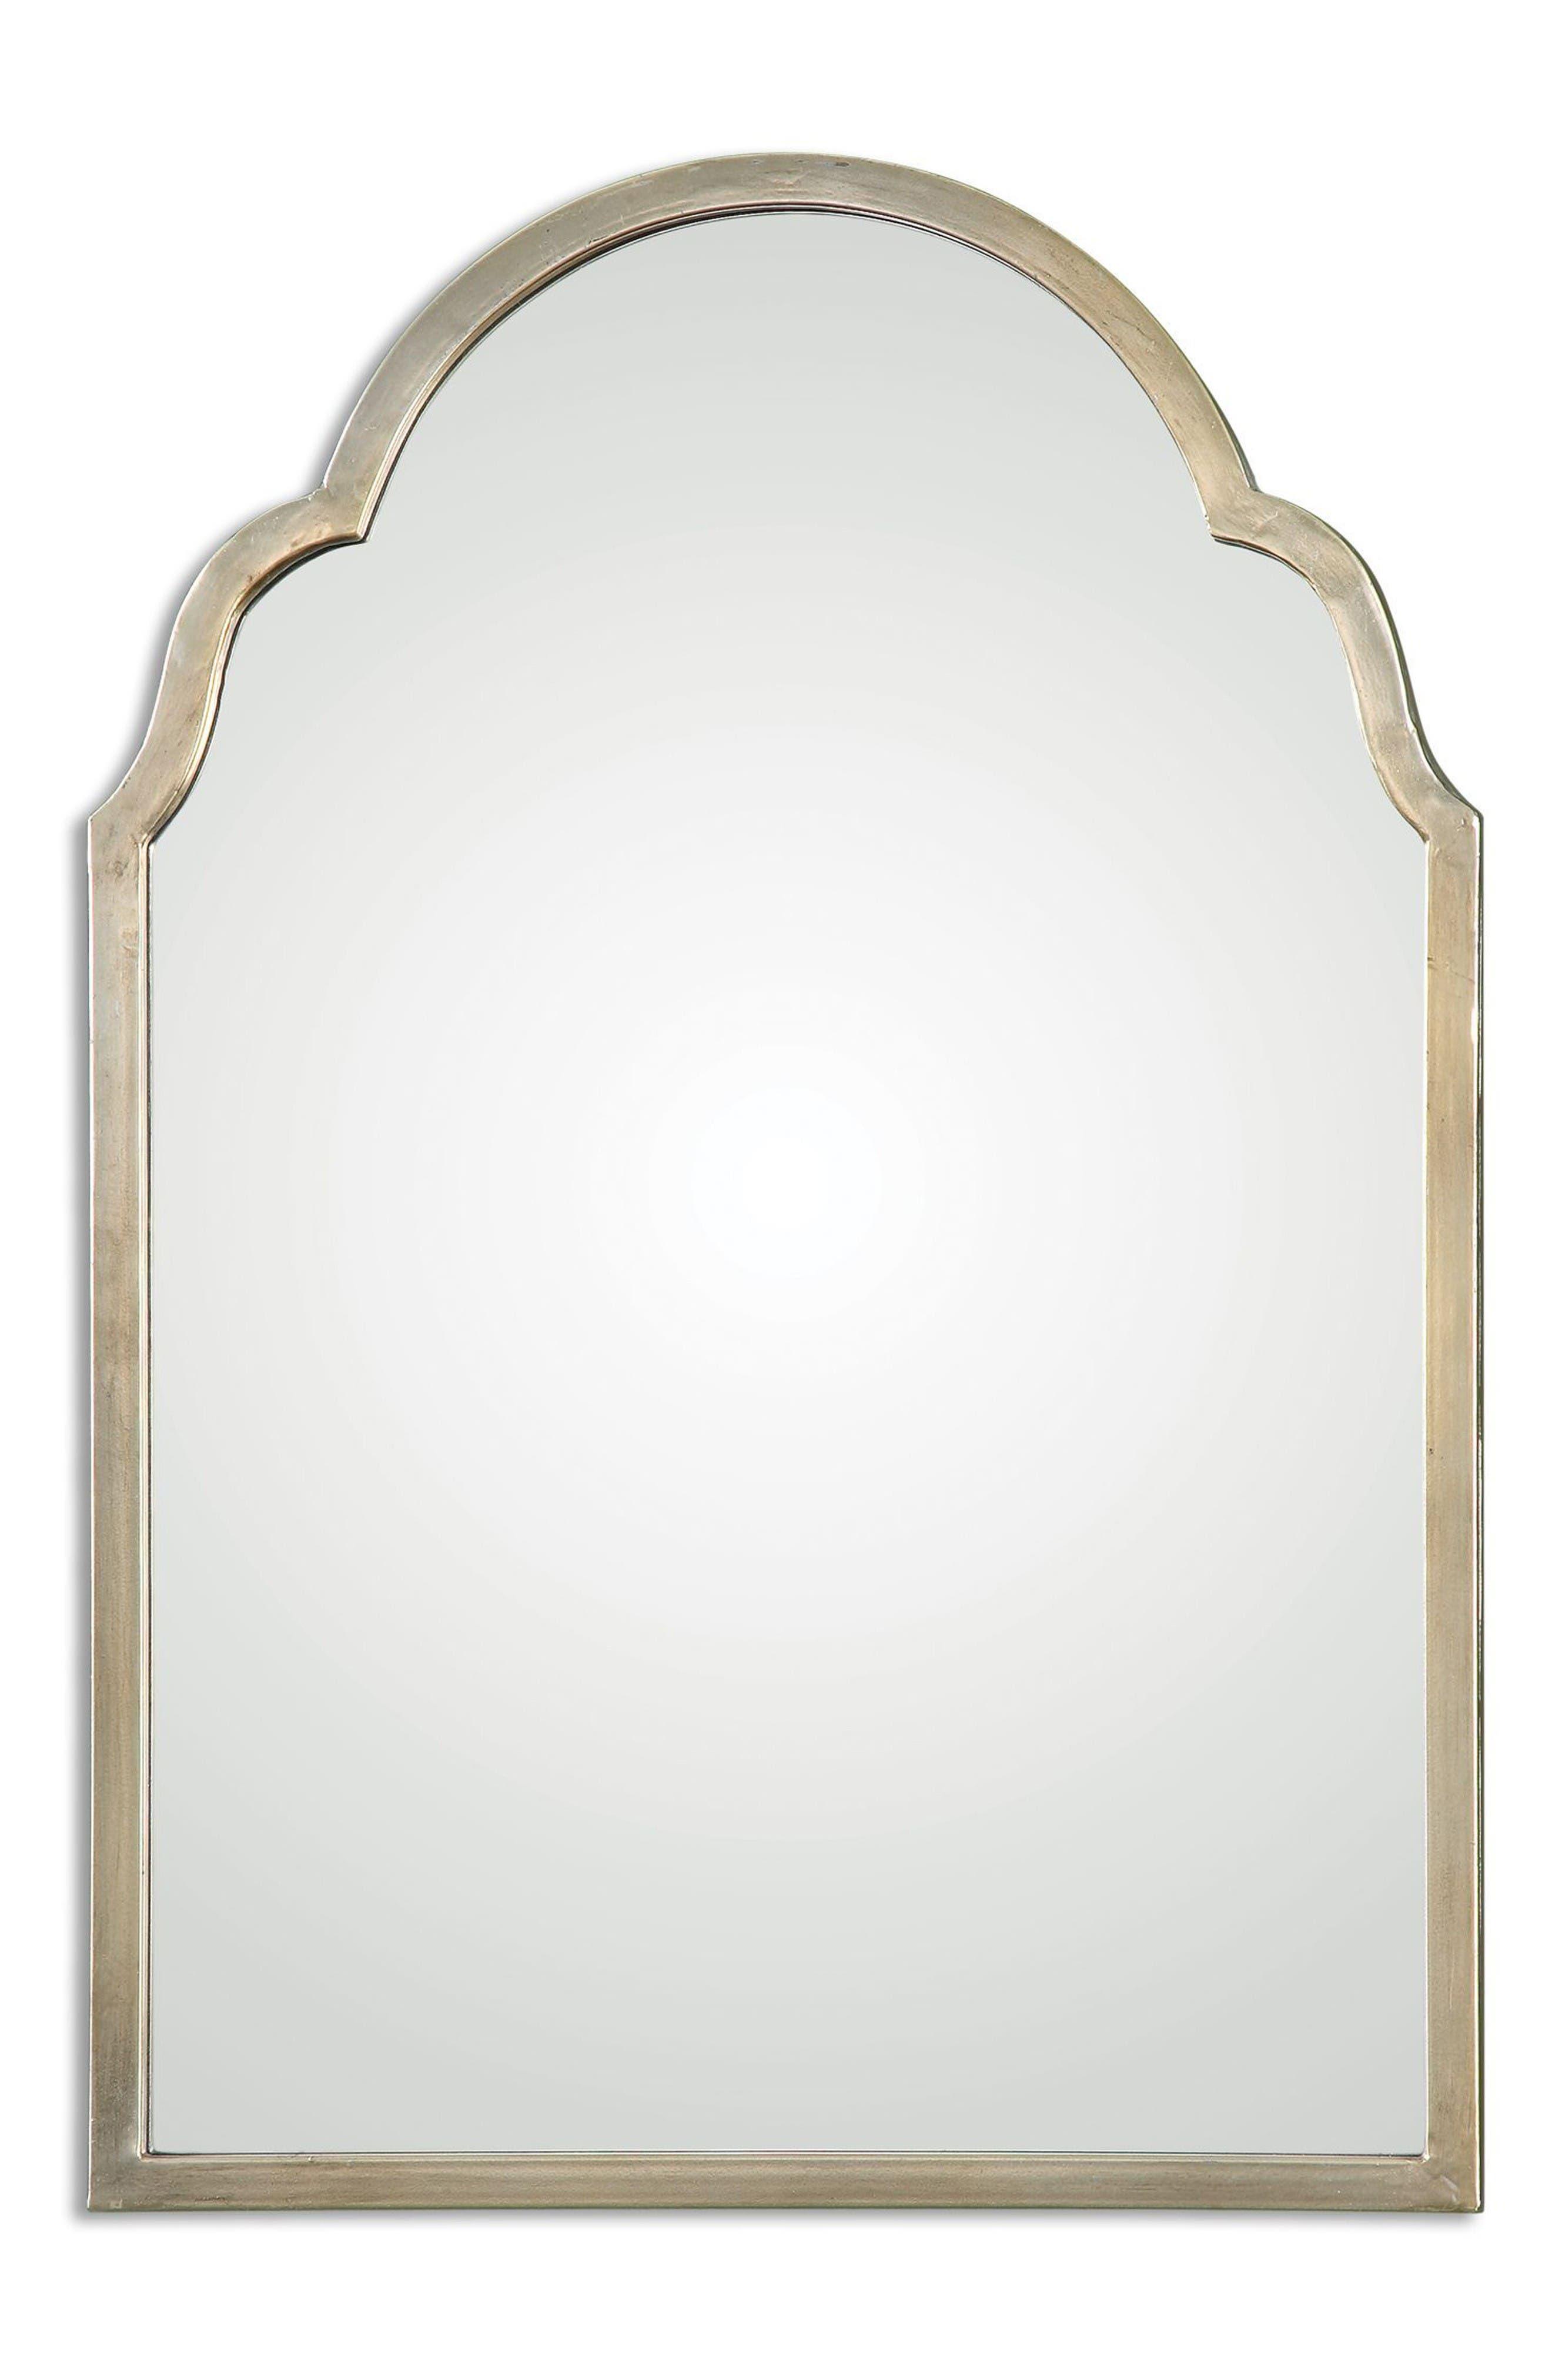 Brayden Small Arch Mirror,                         Main,                         color, Metallic Silver